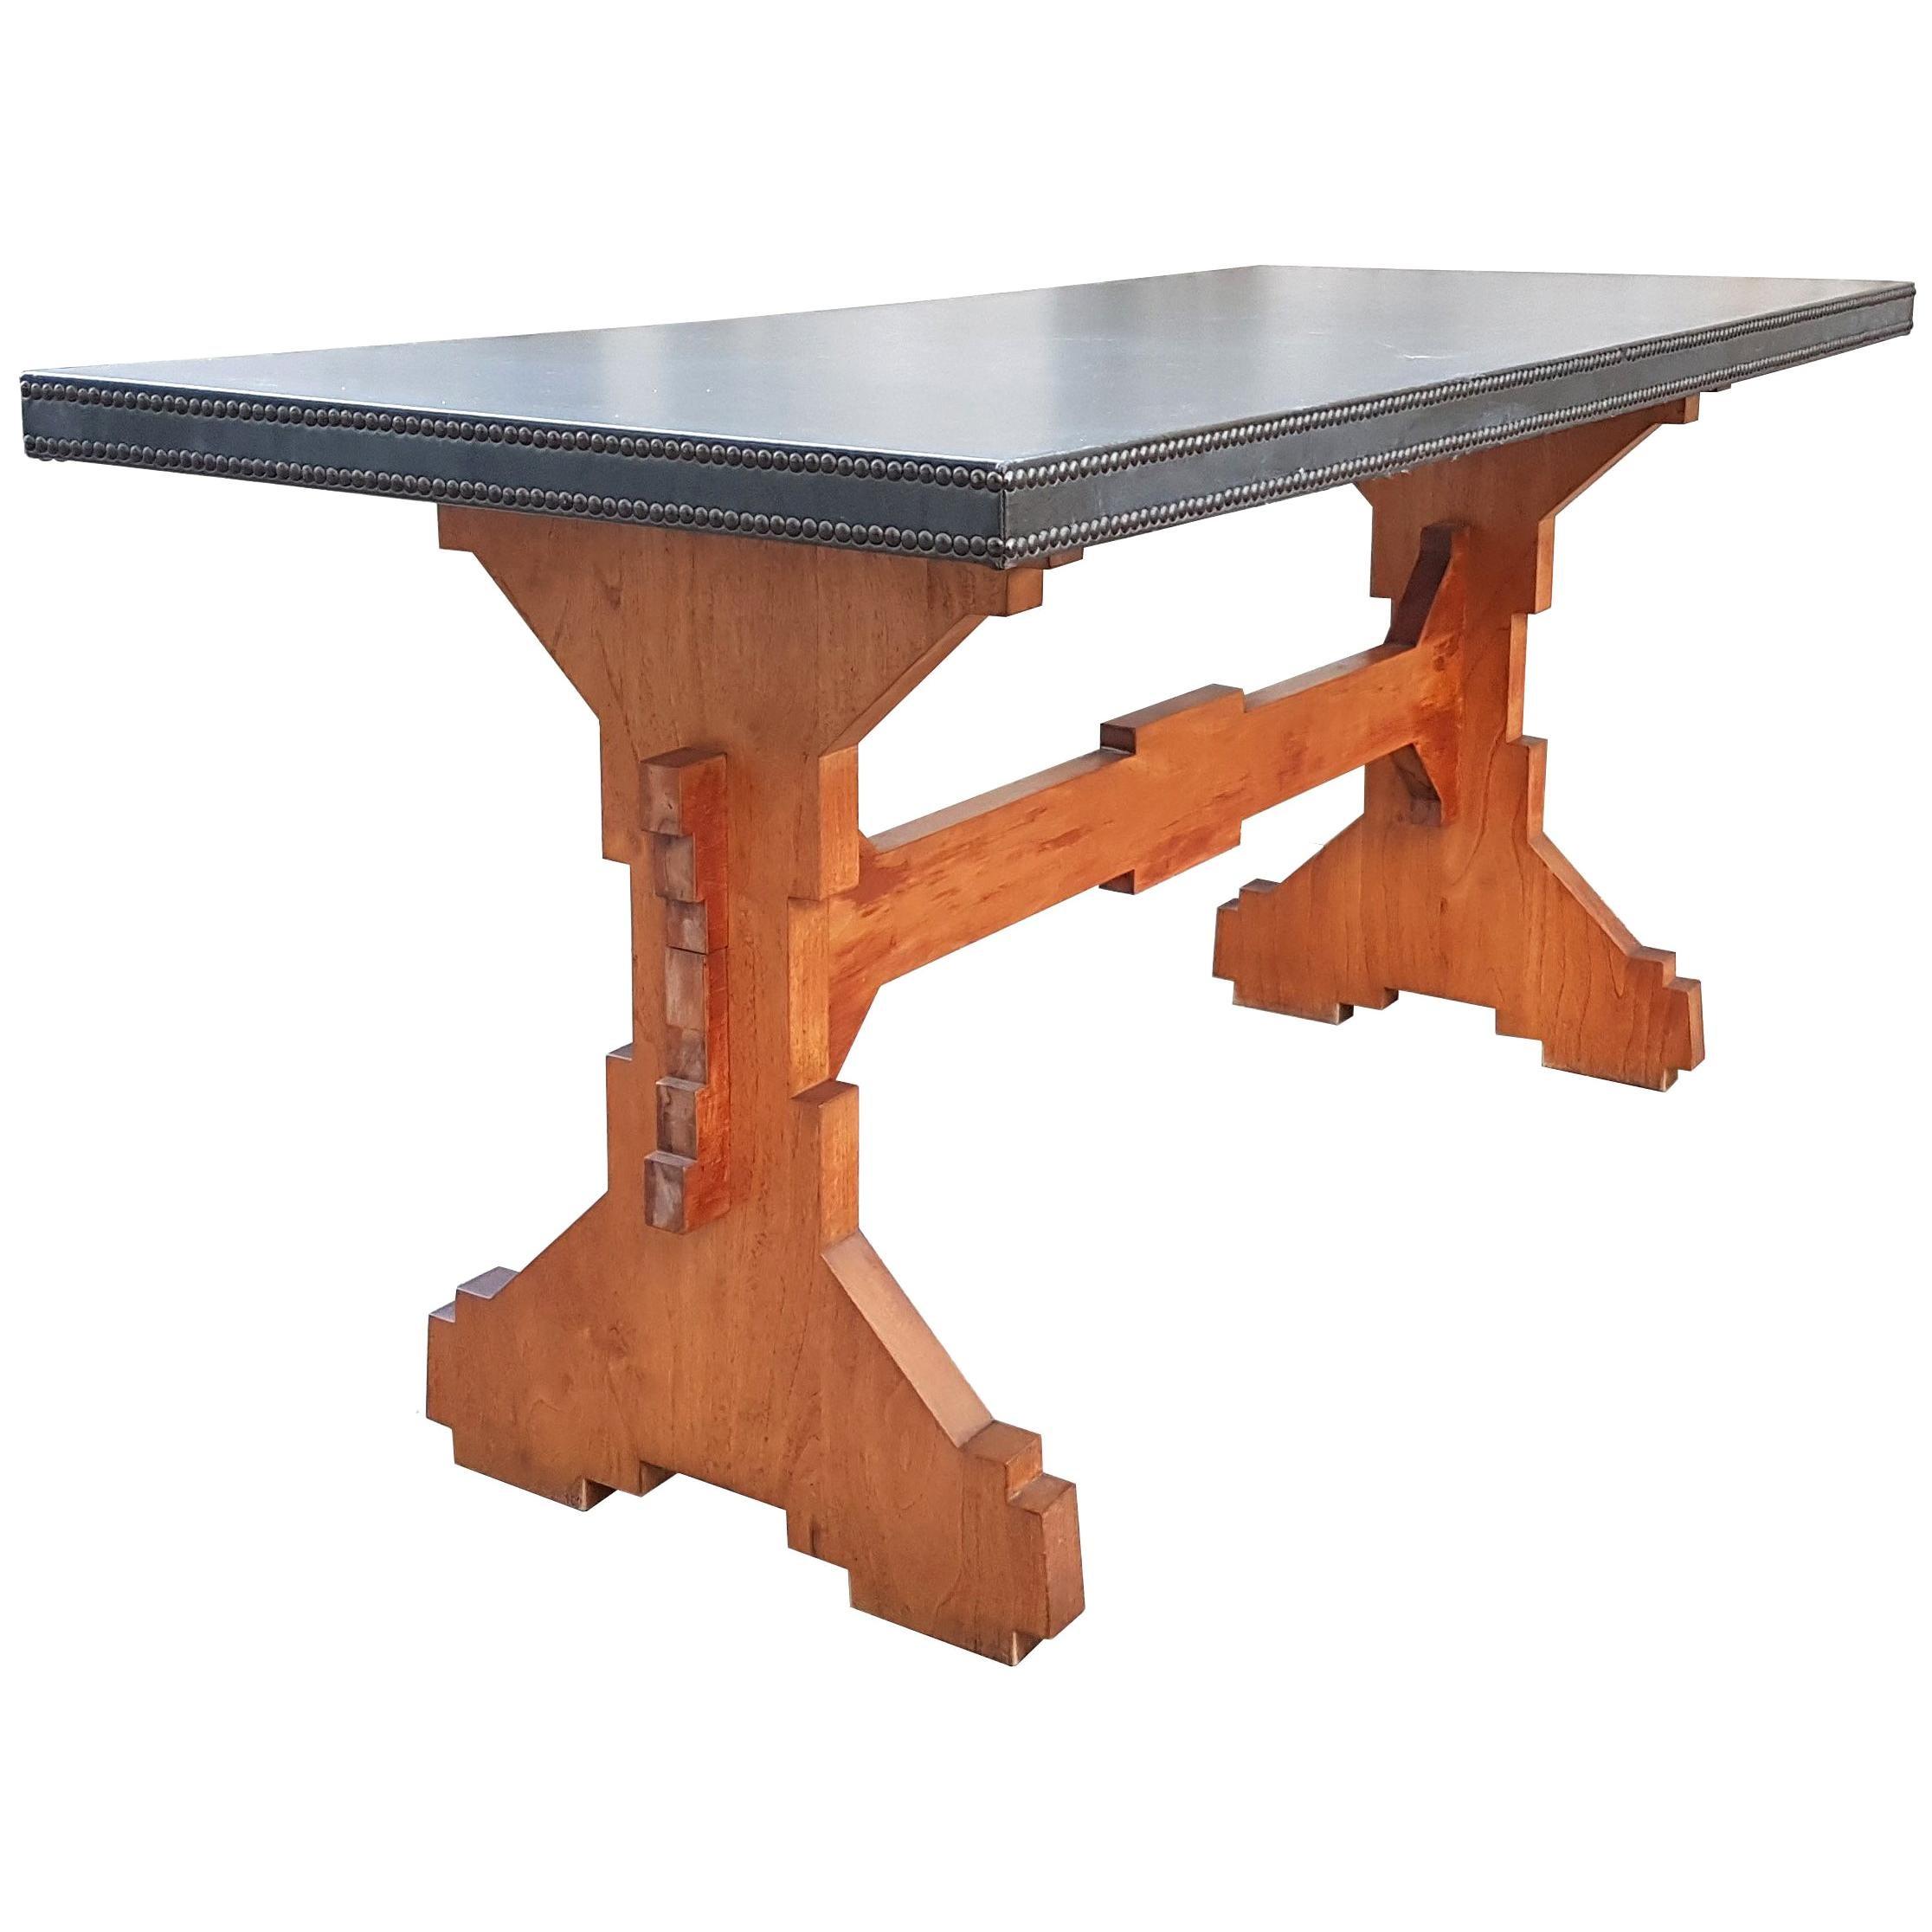 "Wood and Skai Italian ""Fratino"" Dining Table from 1950s"